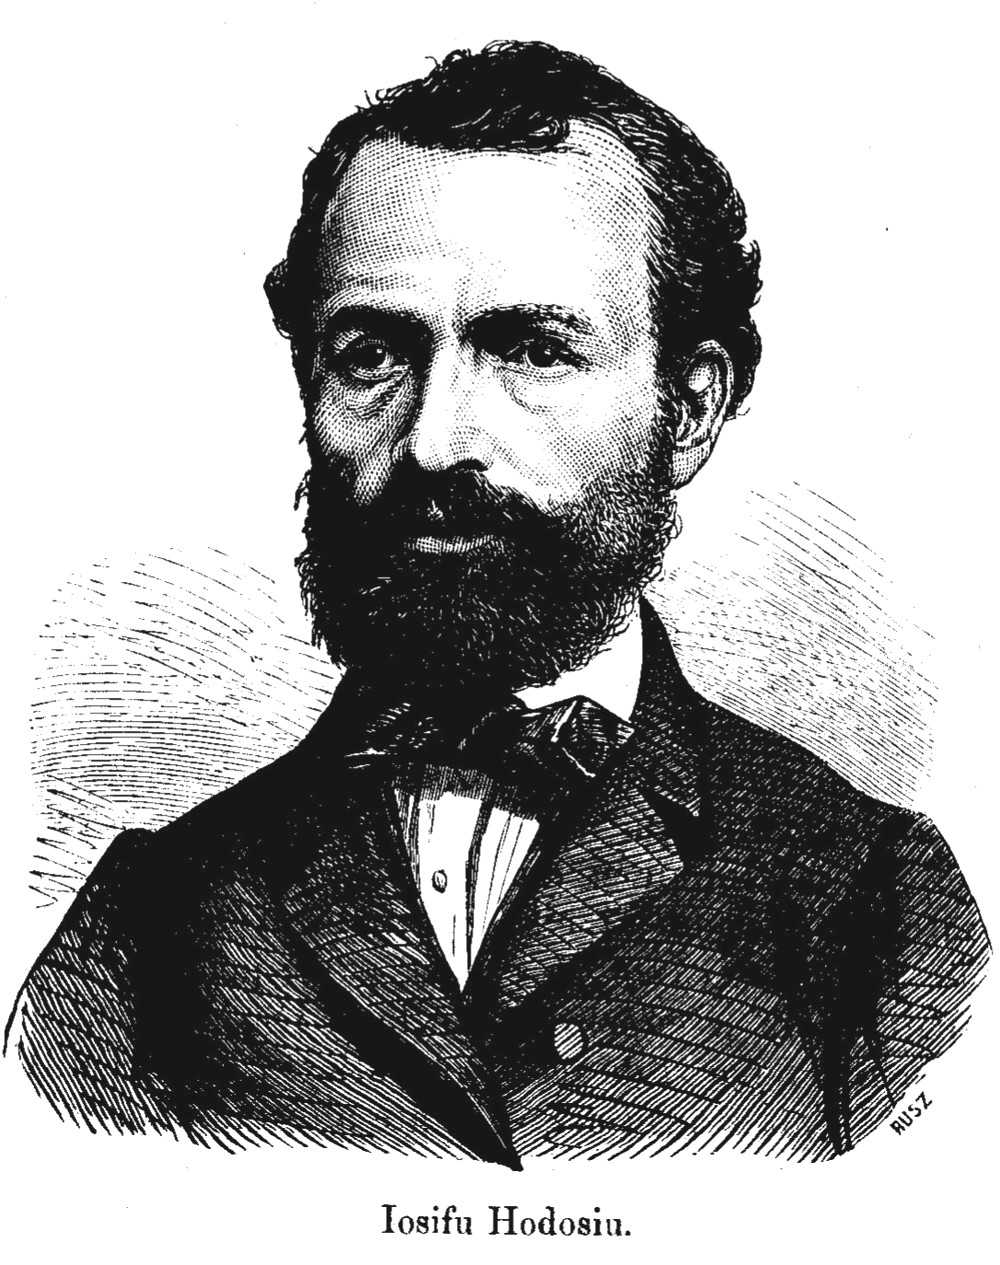 Hodos Iosif Familia 10 din 1866